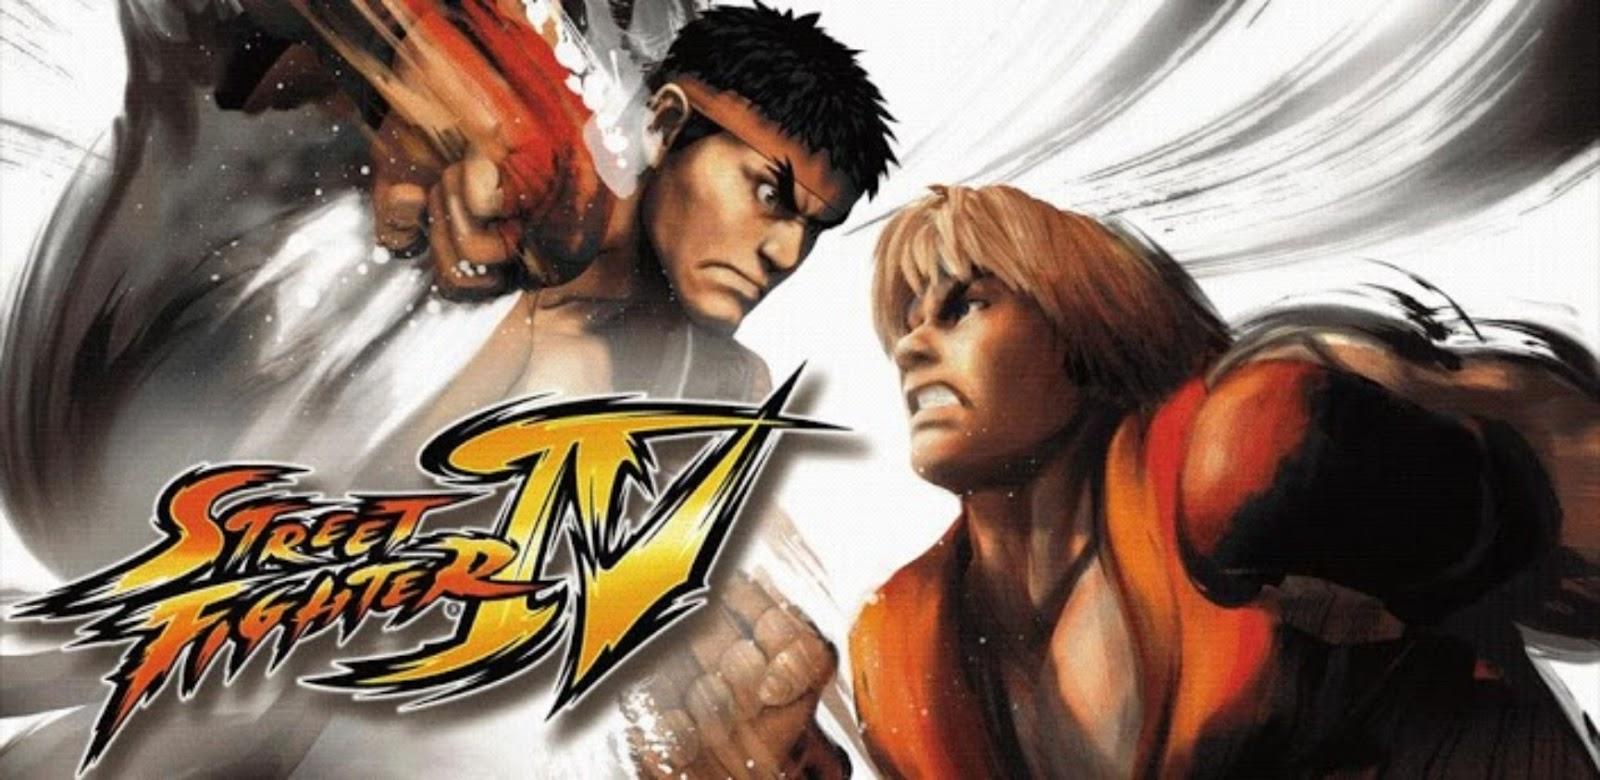 Street Fighter Roid